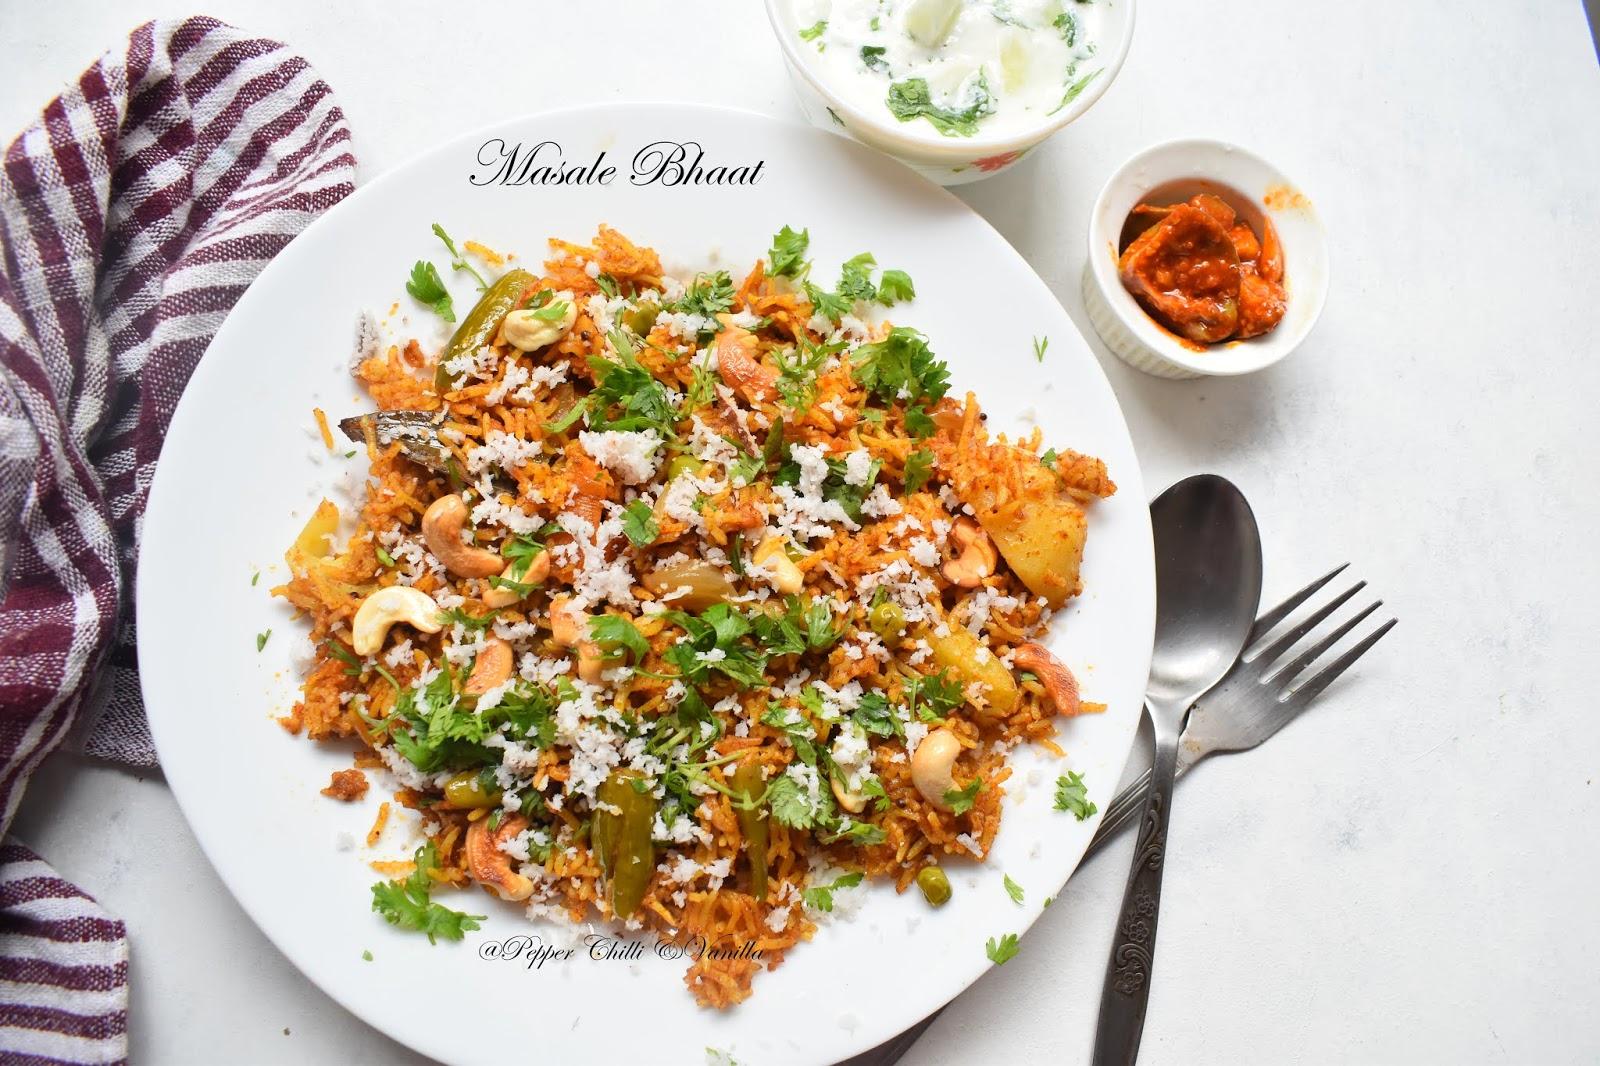 maharastrian masale bhaat recipe